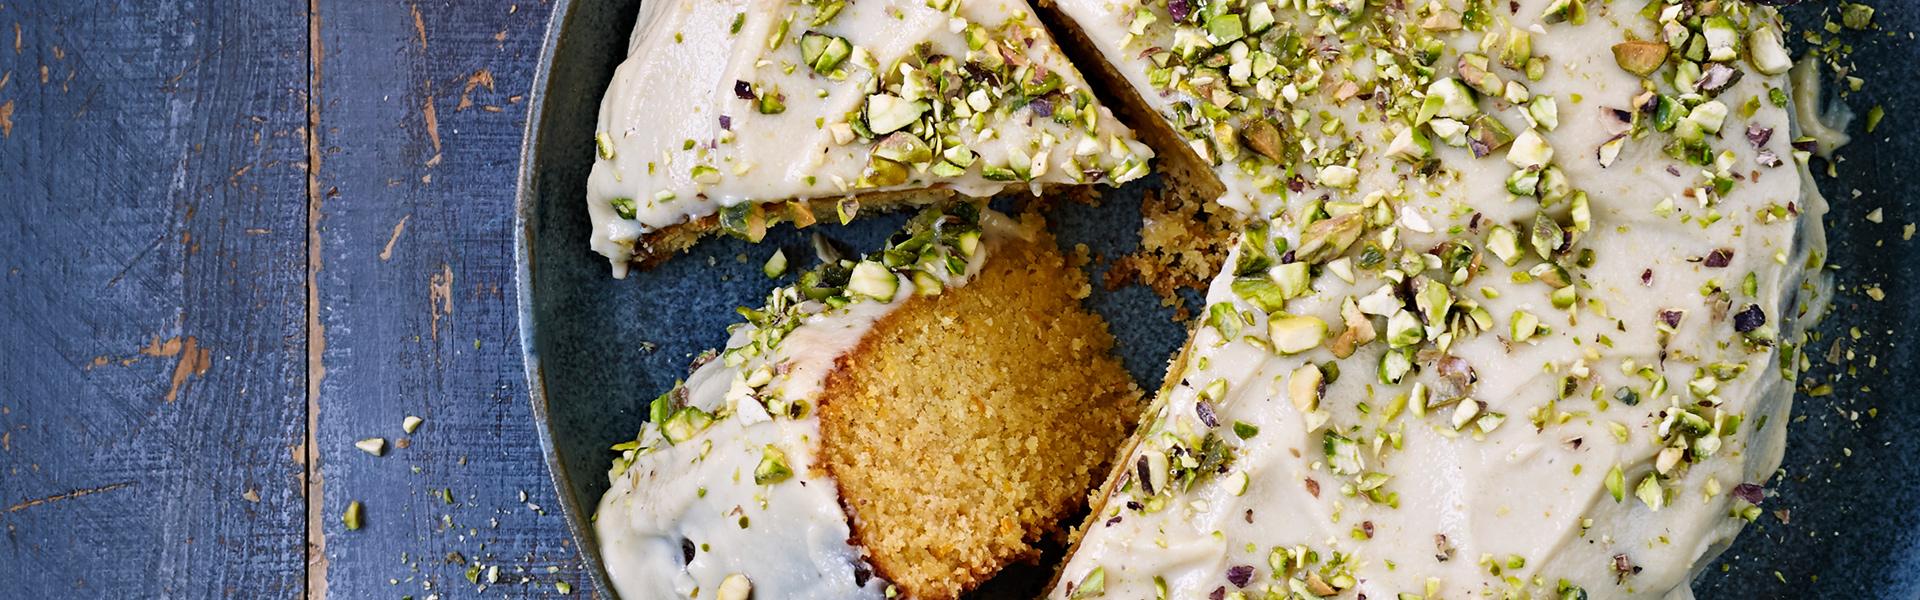 Aine Carlin: Orange Polenta Cake Recipe